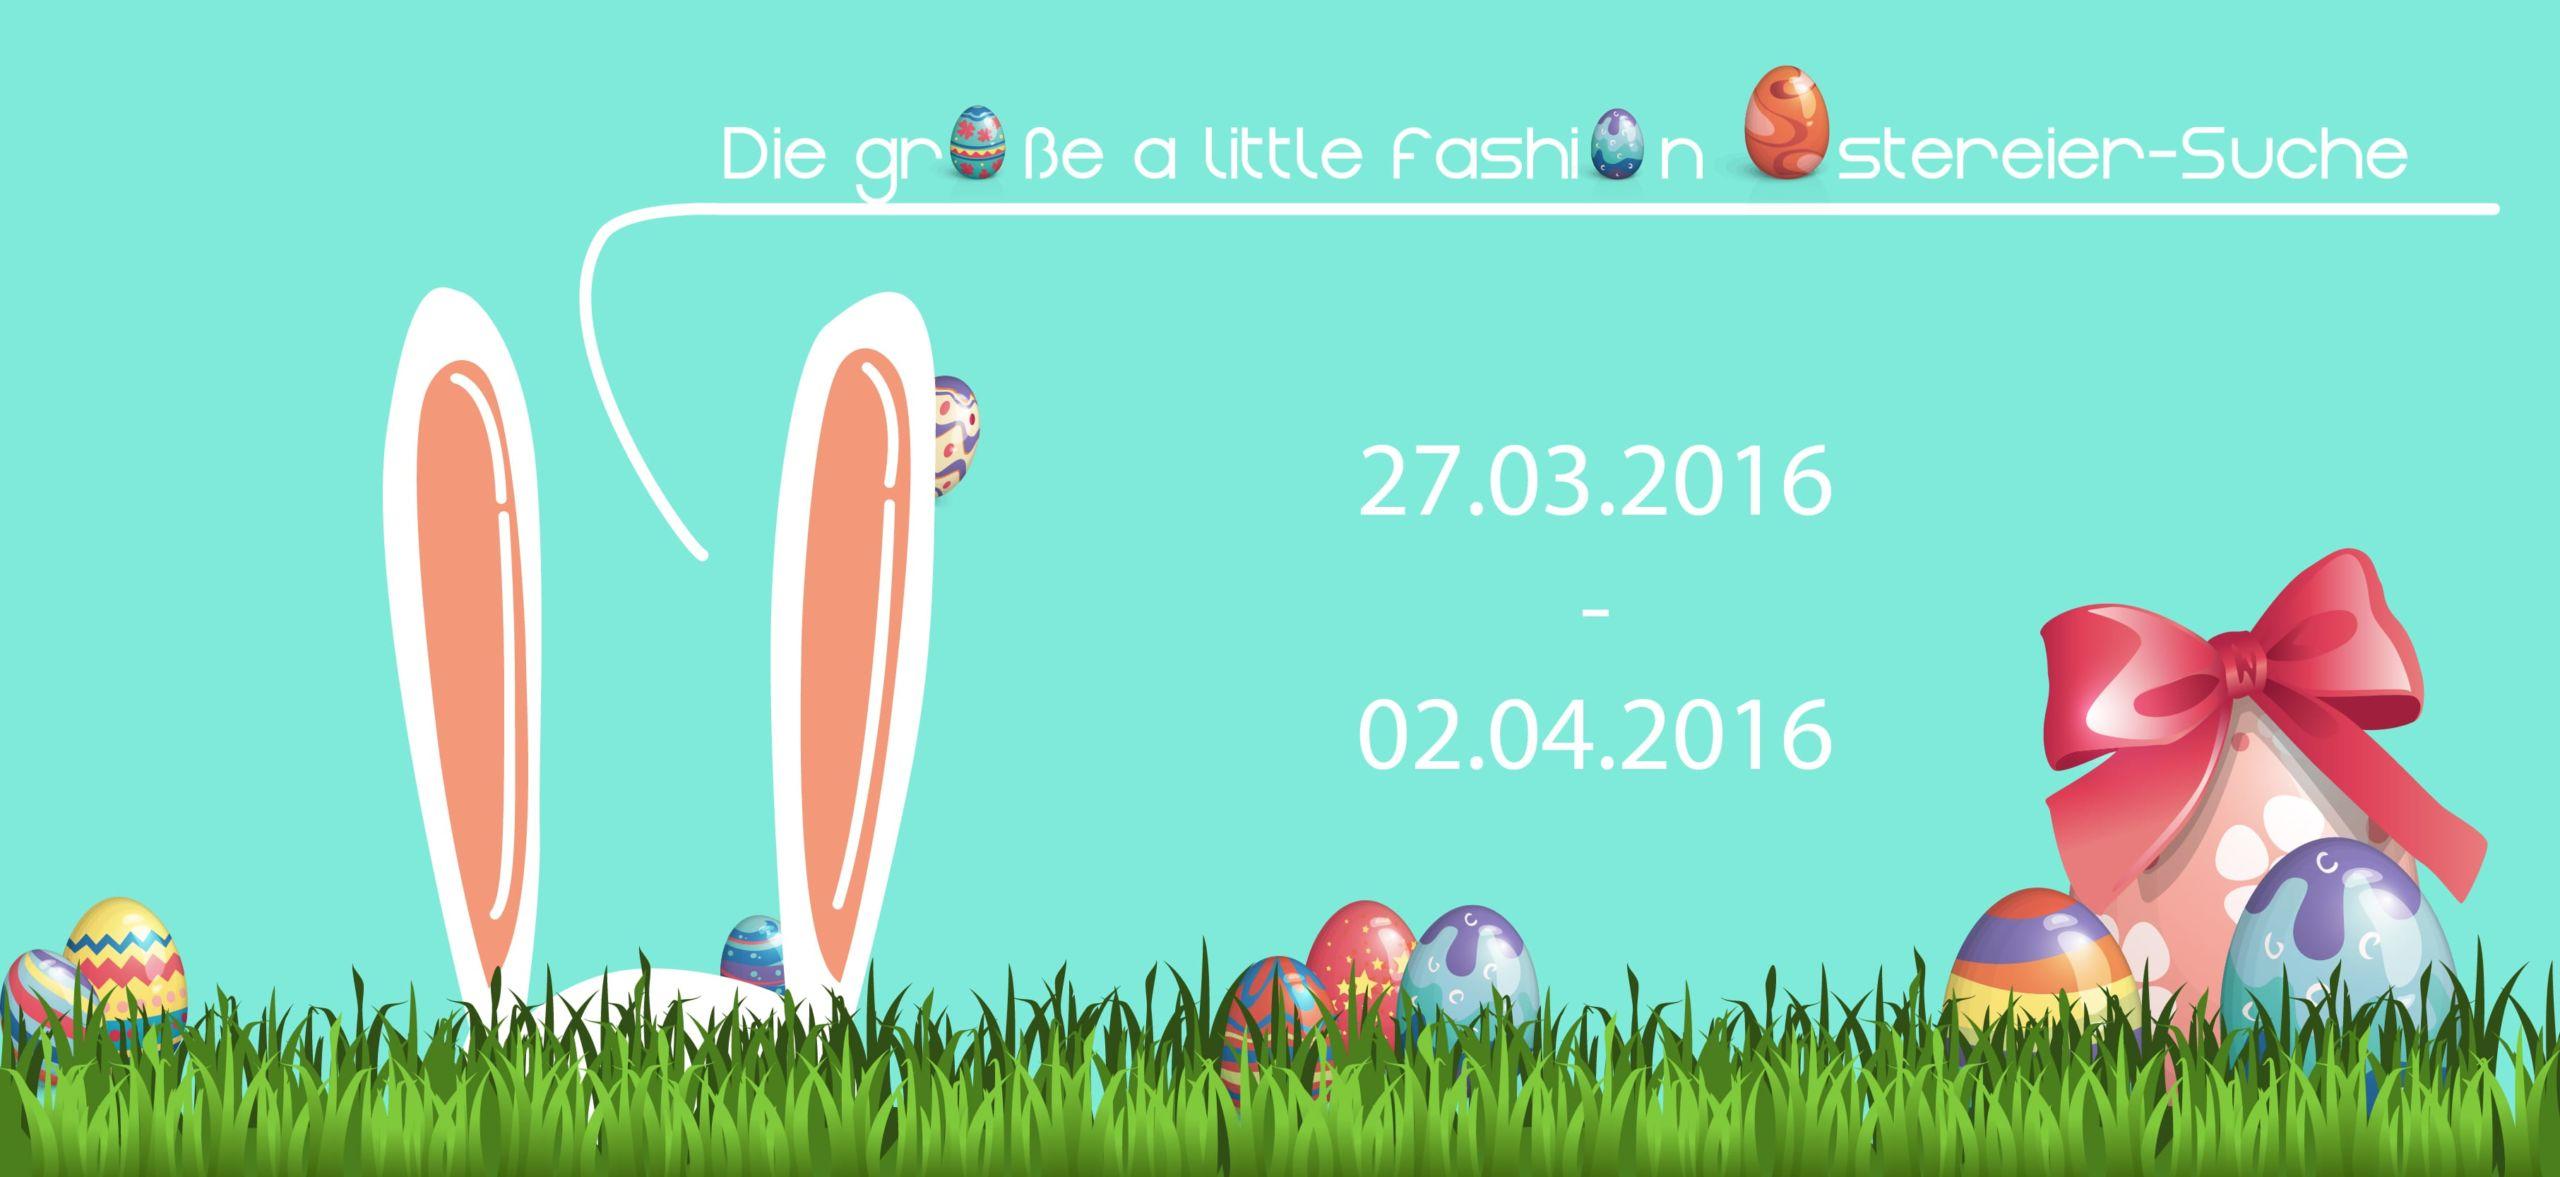 Die große A.L.F. Ostereier-Suche | coming soon...